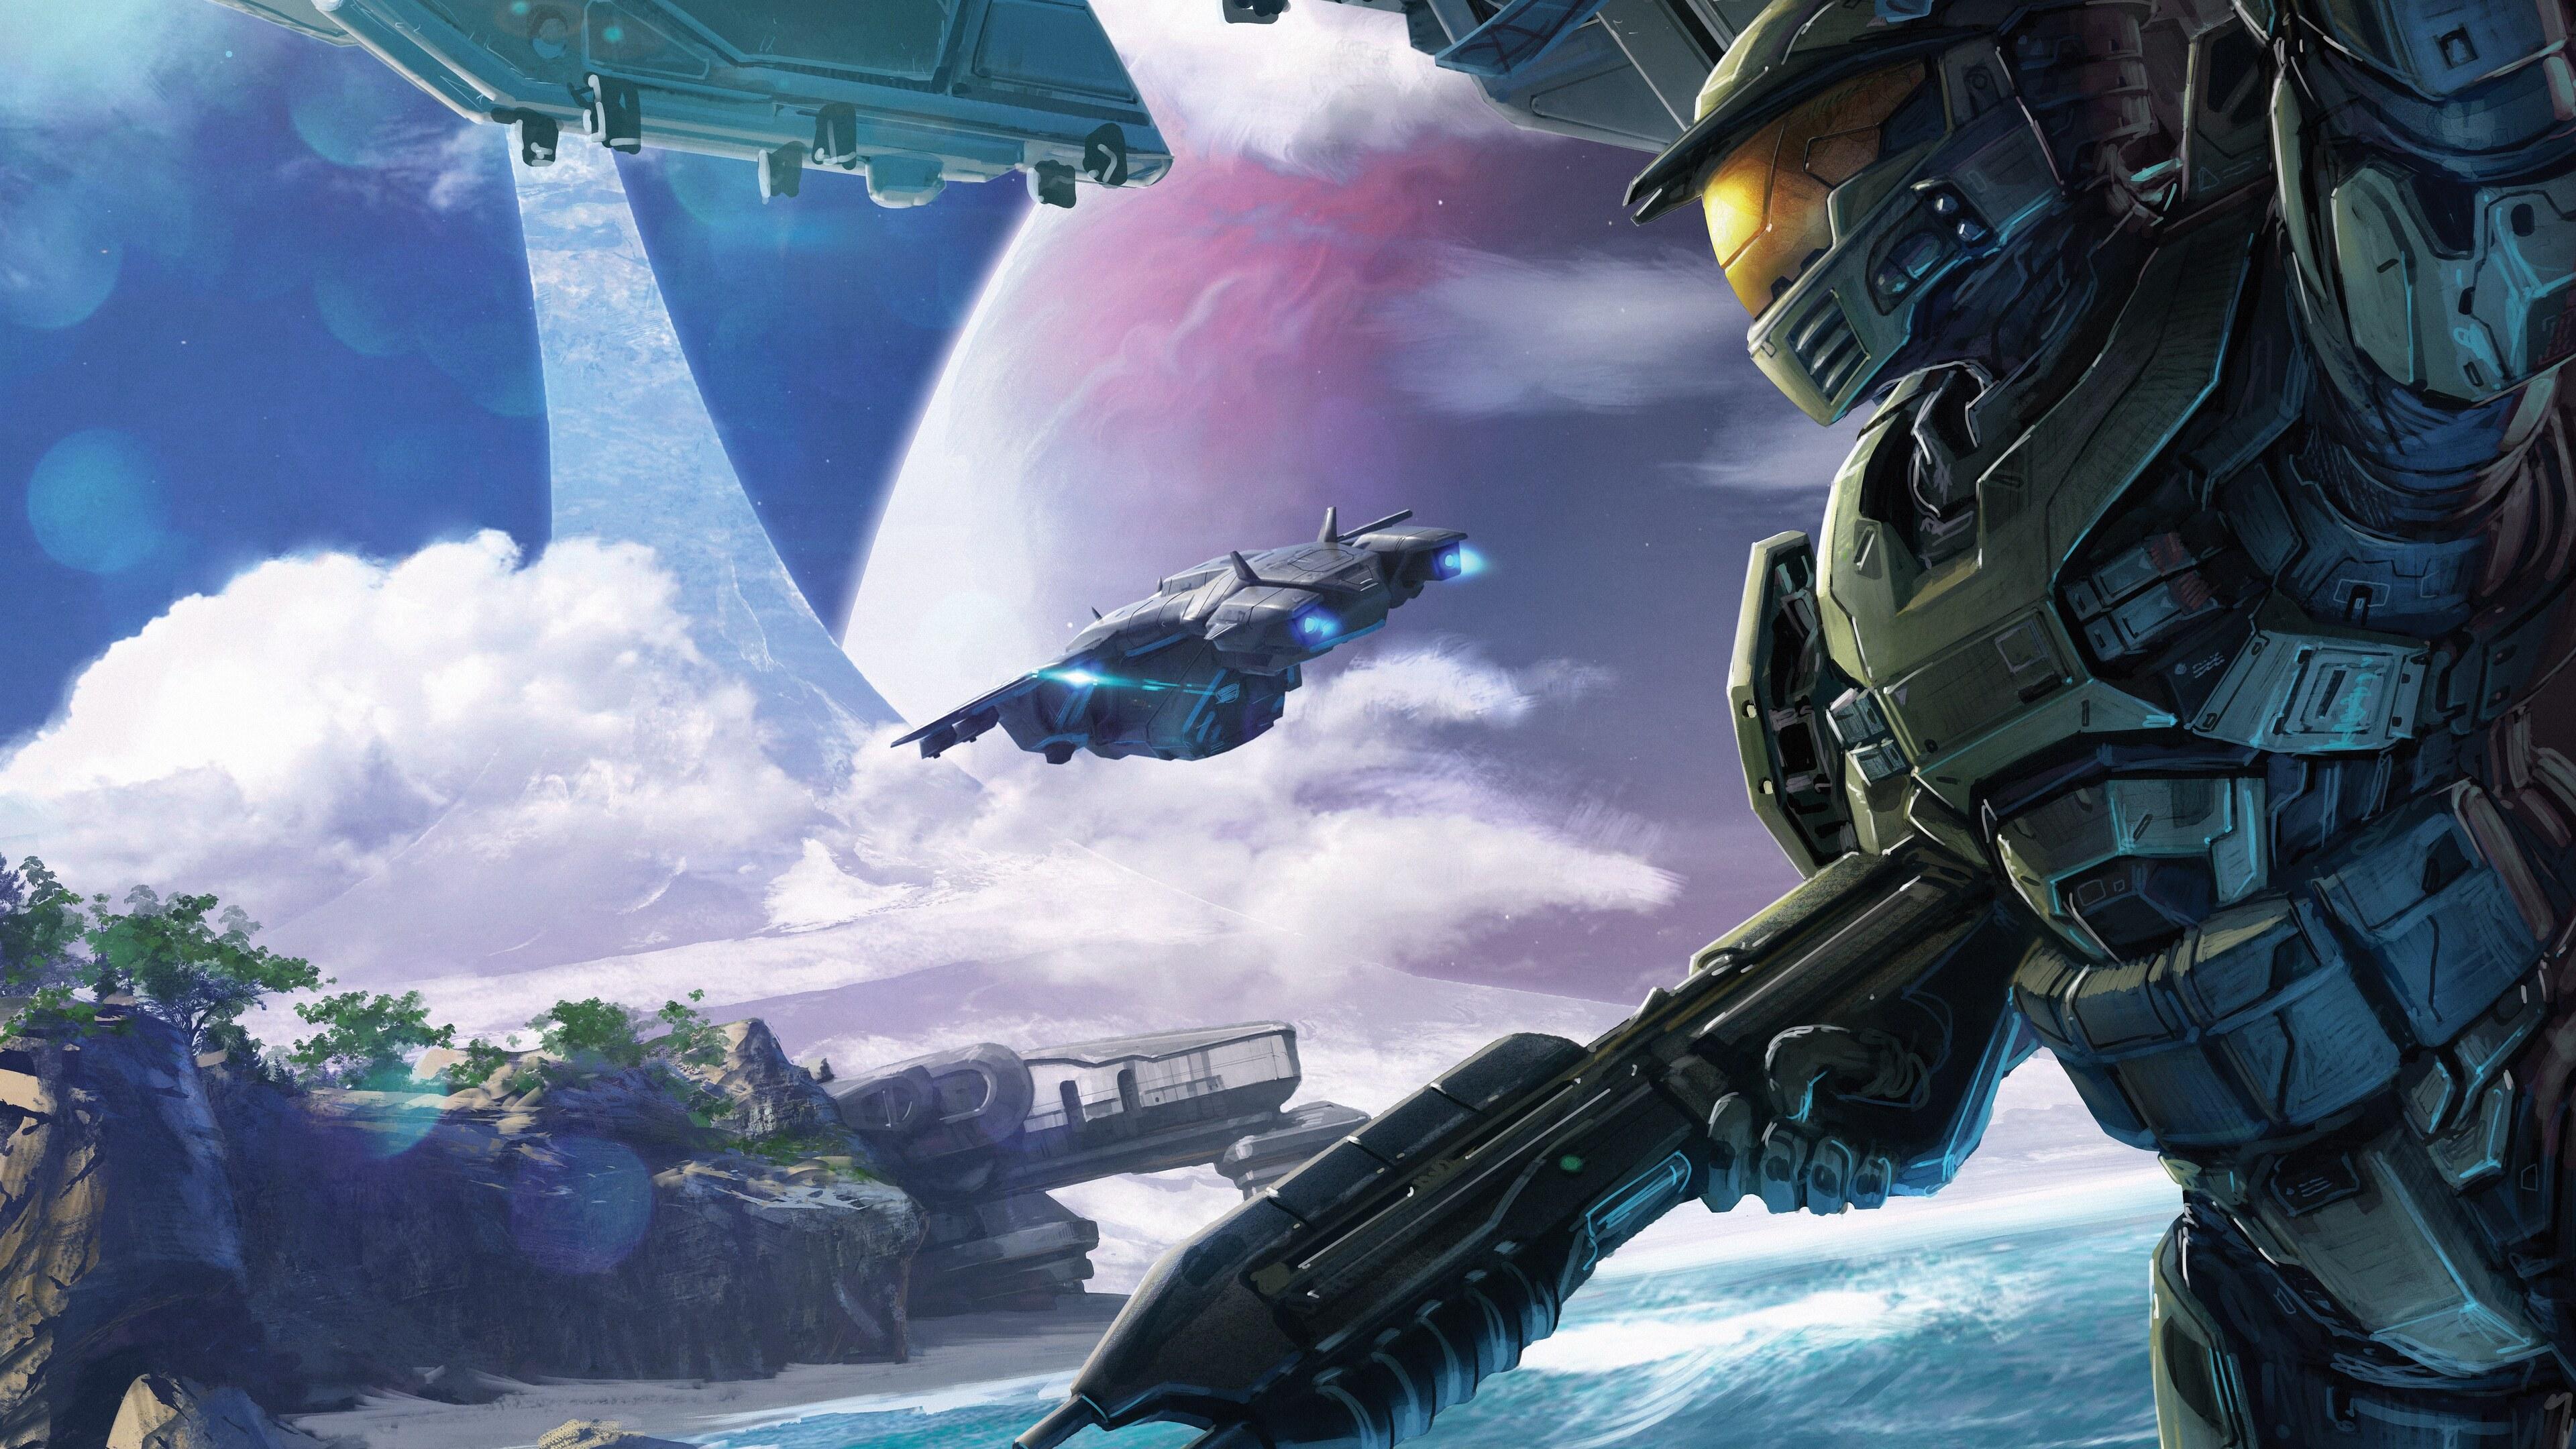 3840x2160 Halo Conflict Artwork 5k 4k HD 4k Wallpapers ...